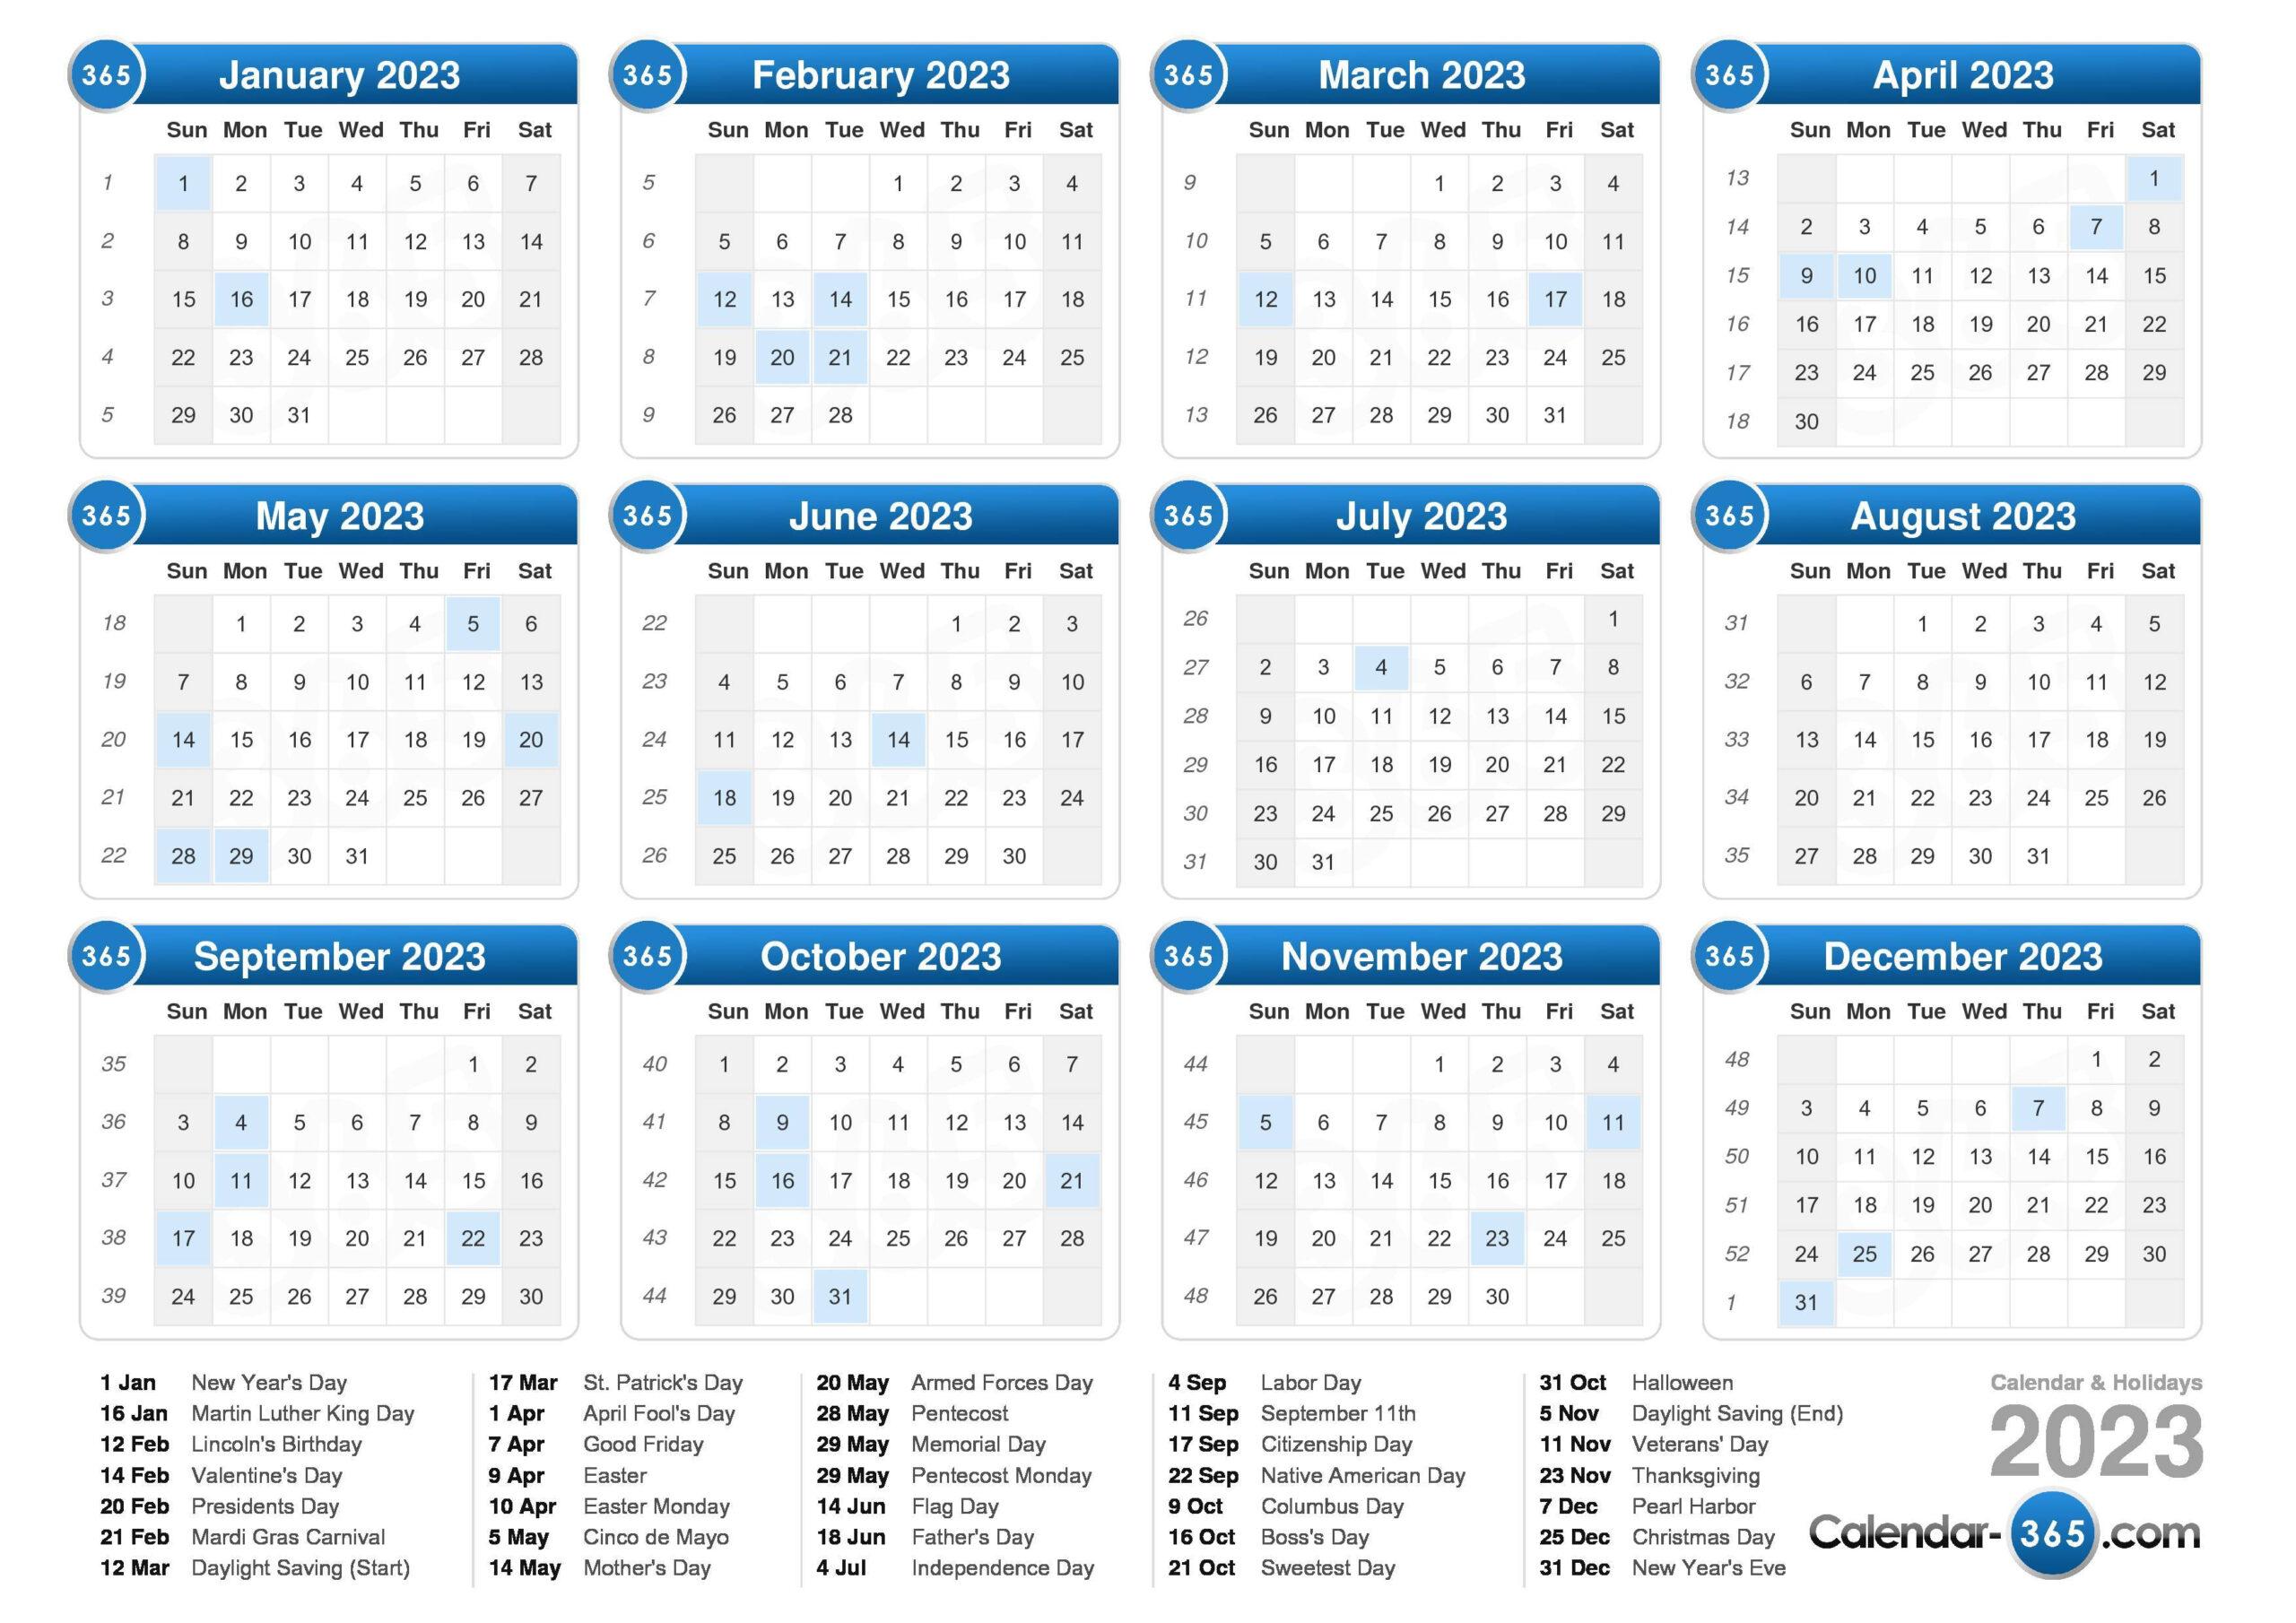 2023 Calendar with regard to 2021 - 2023 Four Year Monthly Calendar